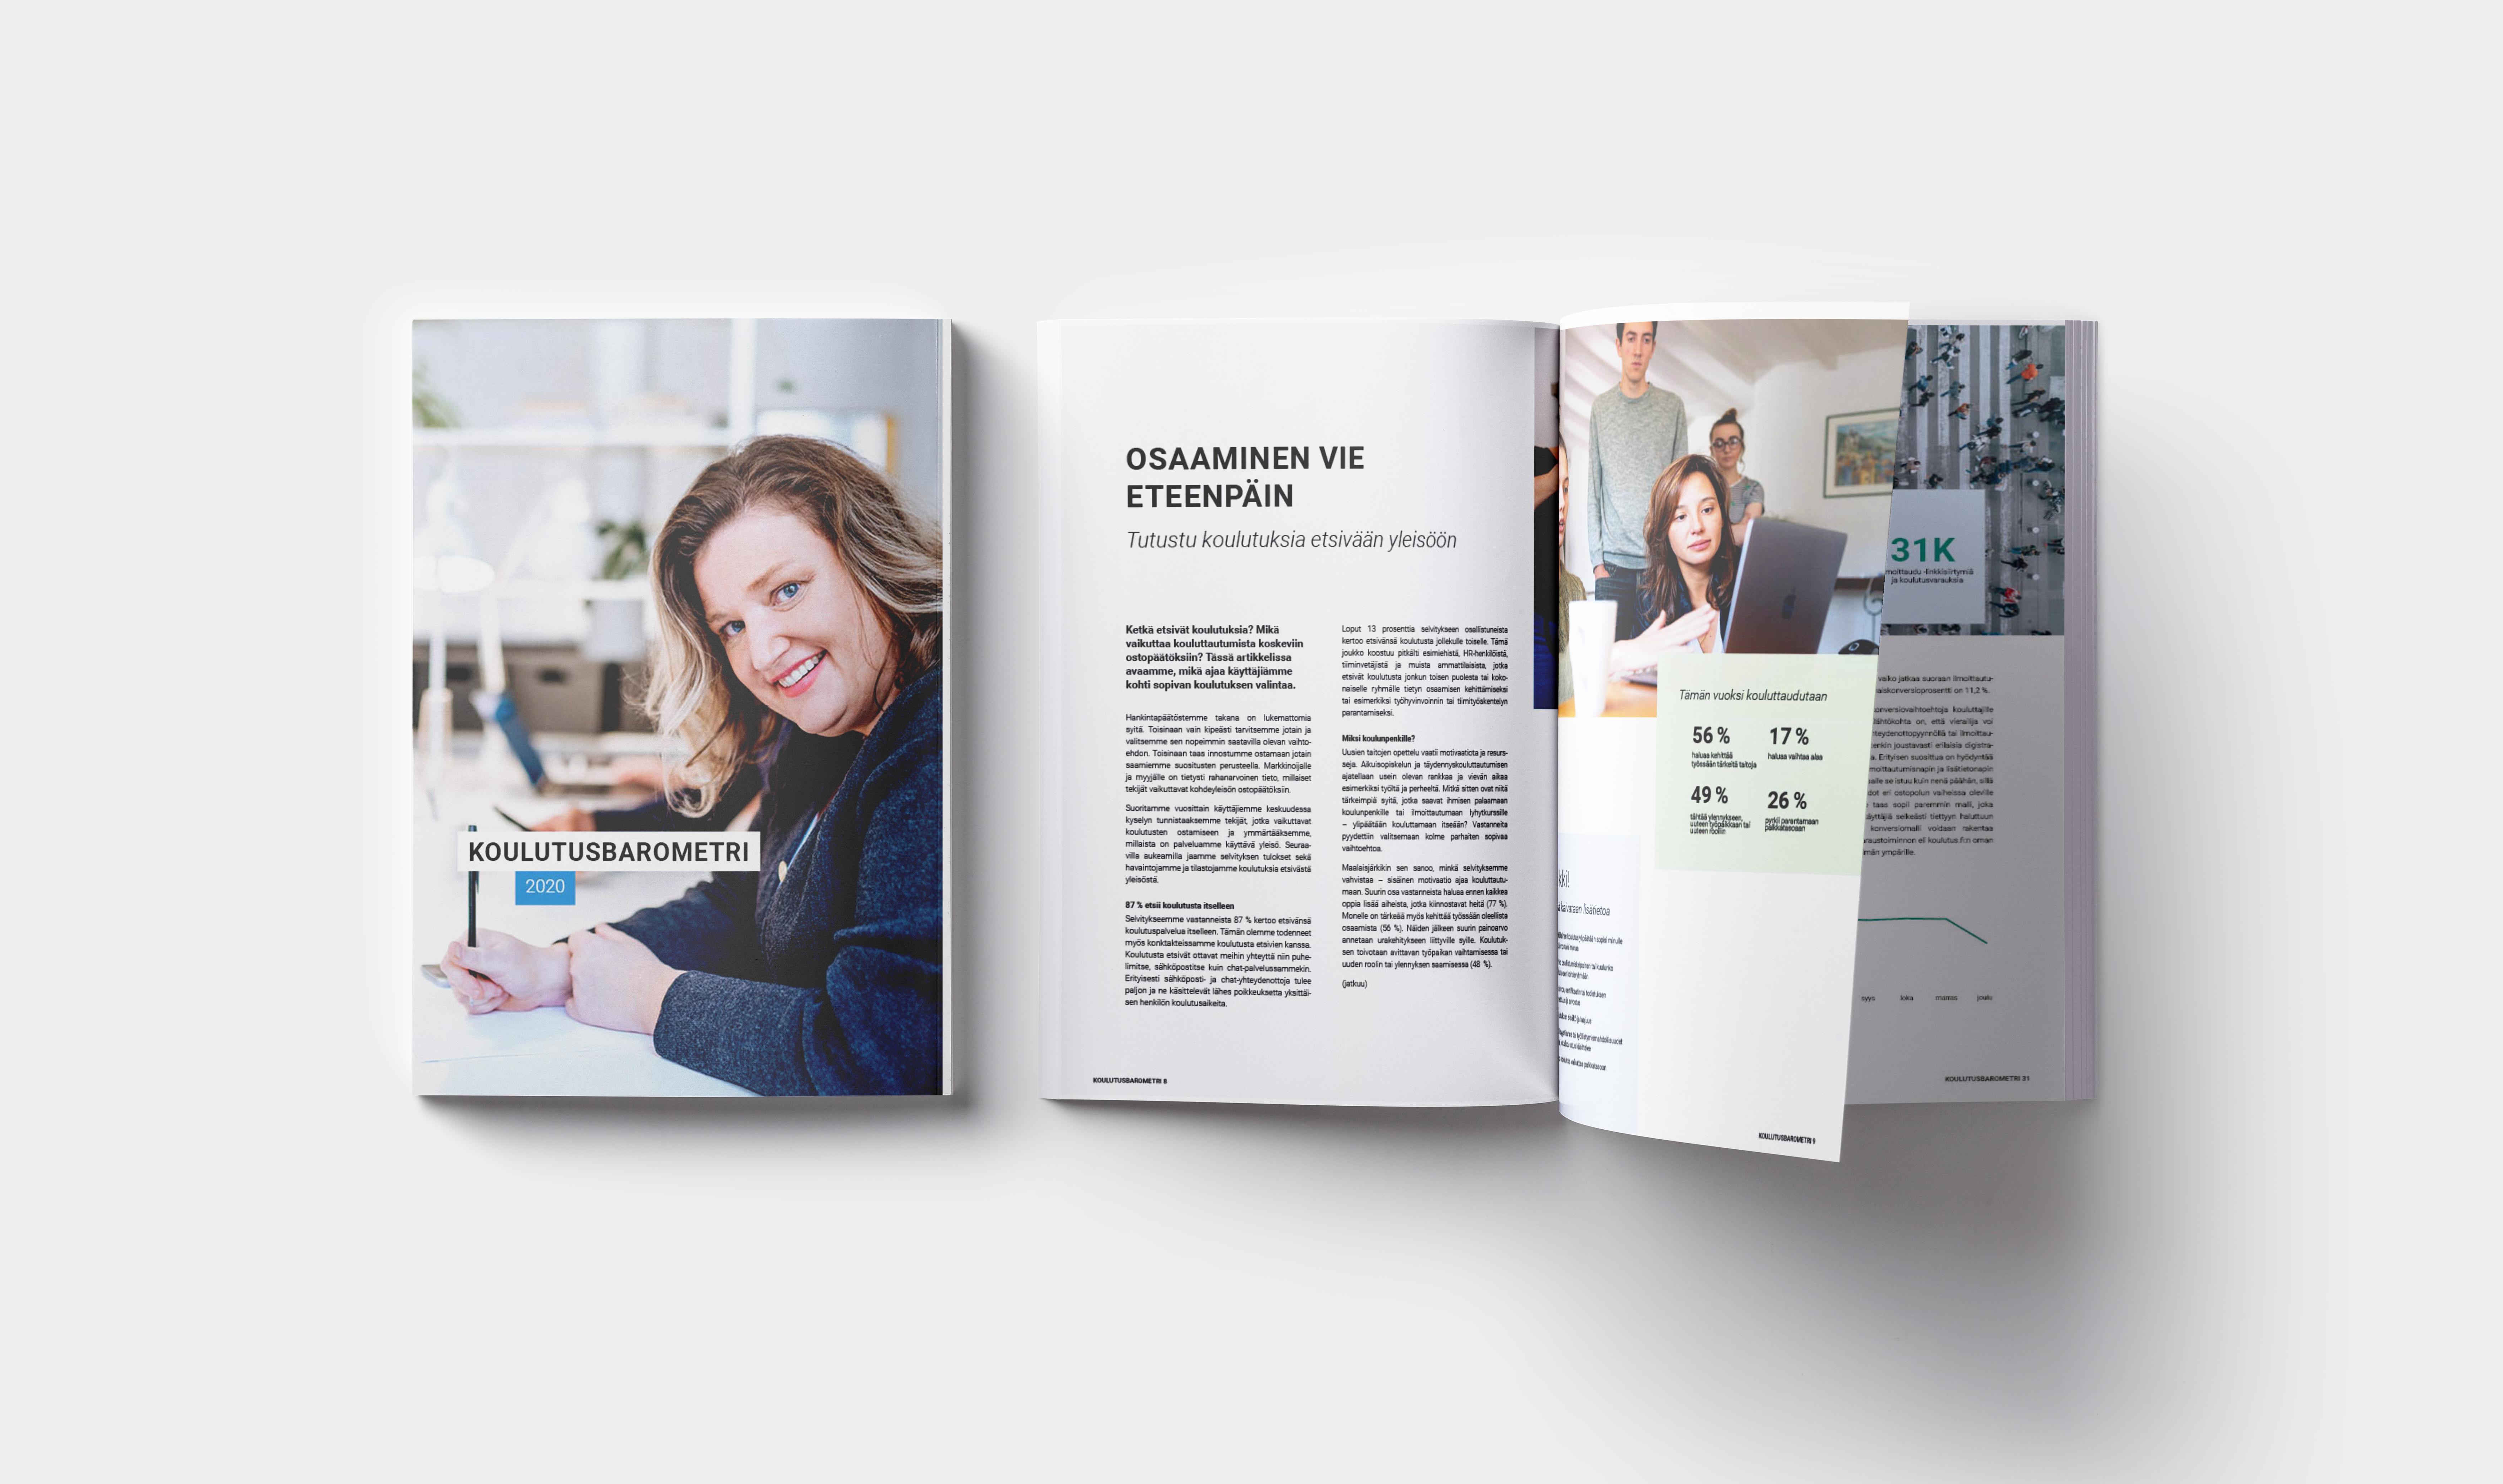 Magazine-Mockup-koulutusfi-2020-harmaa